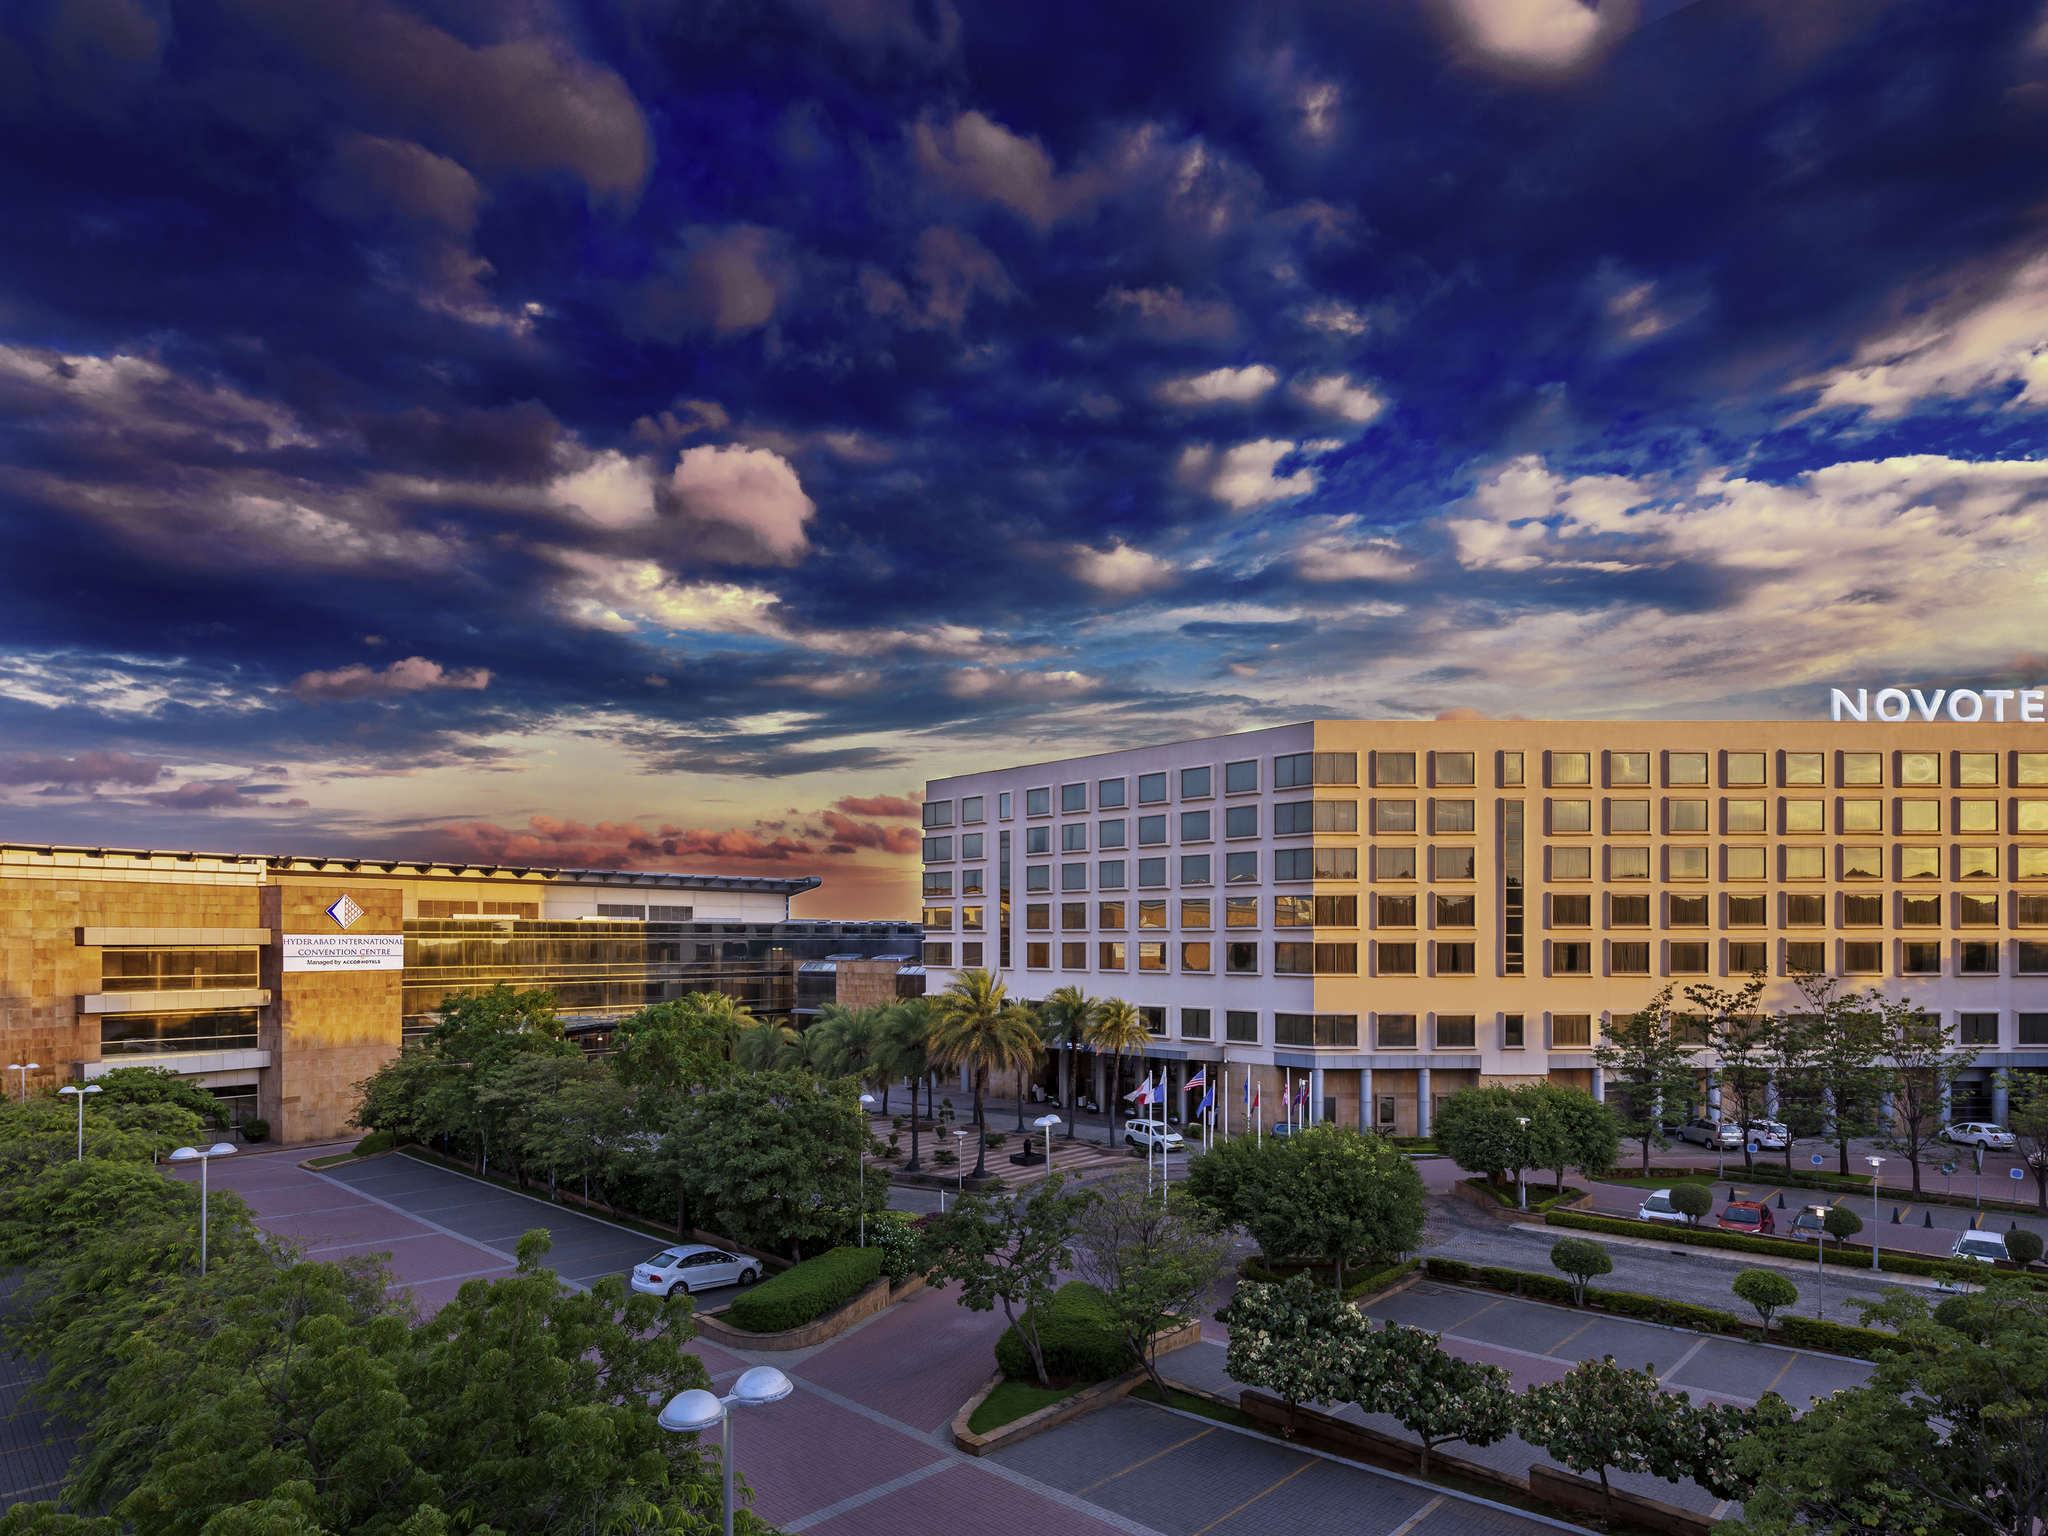 Hotell – Novotel Hyderabad Convention Centre